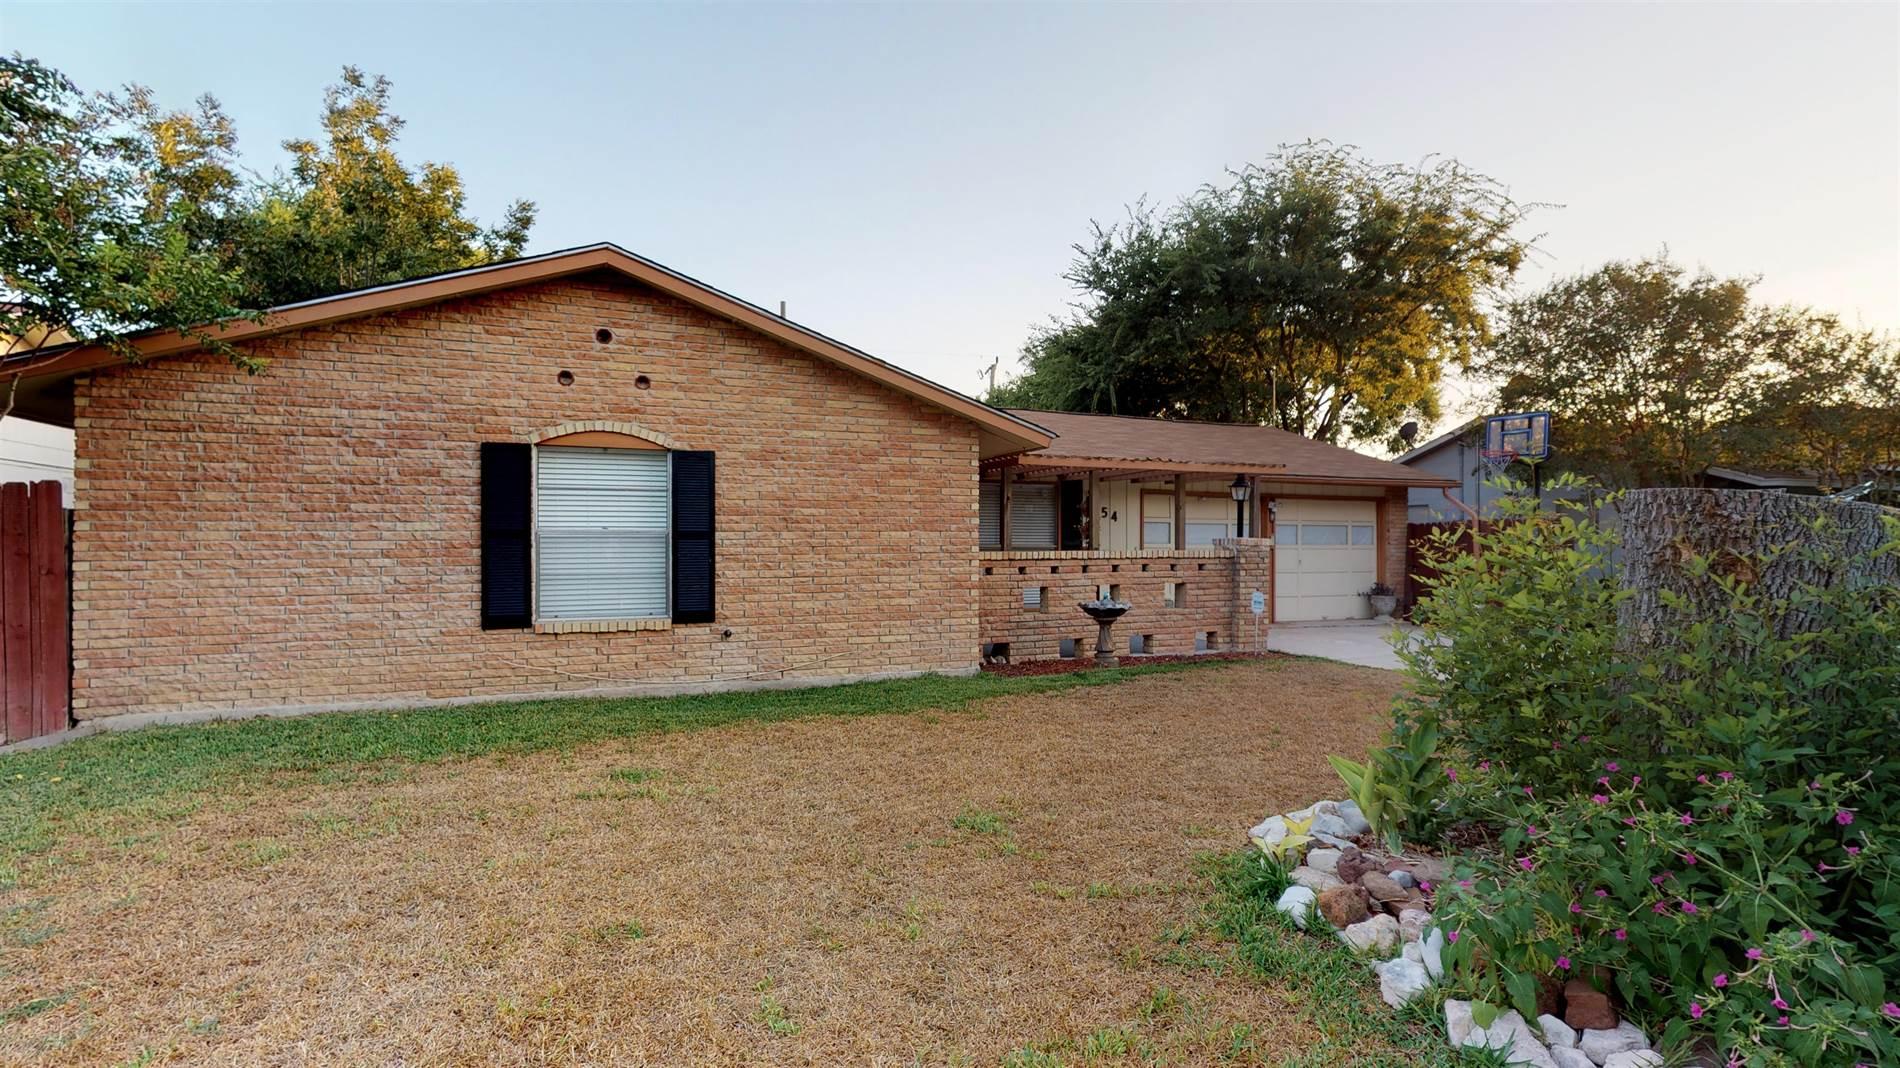 4354 Sunshadow St, San Antonio, TX 78217